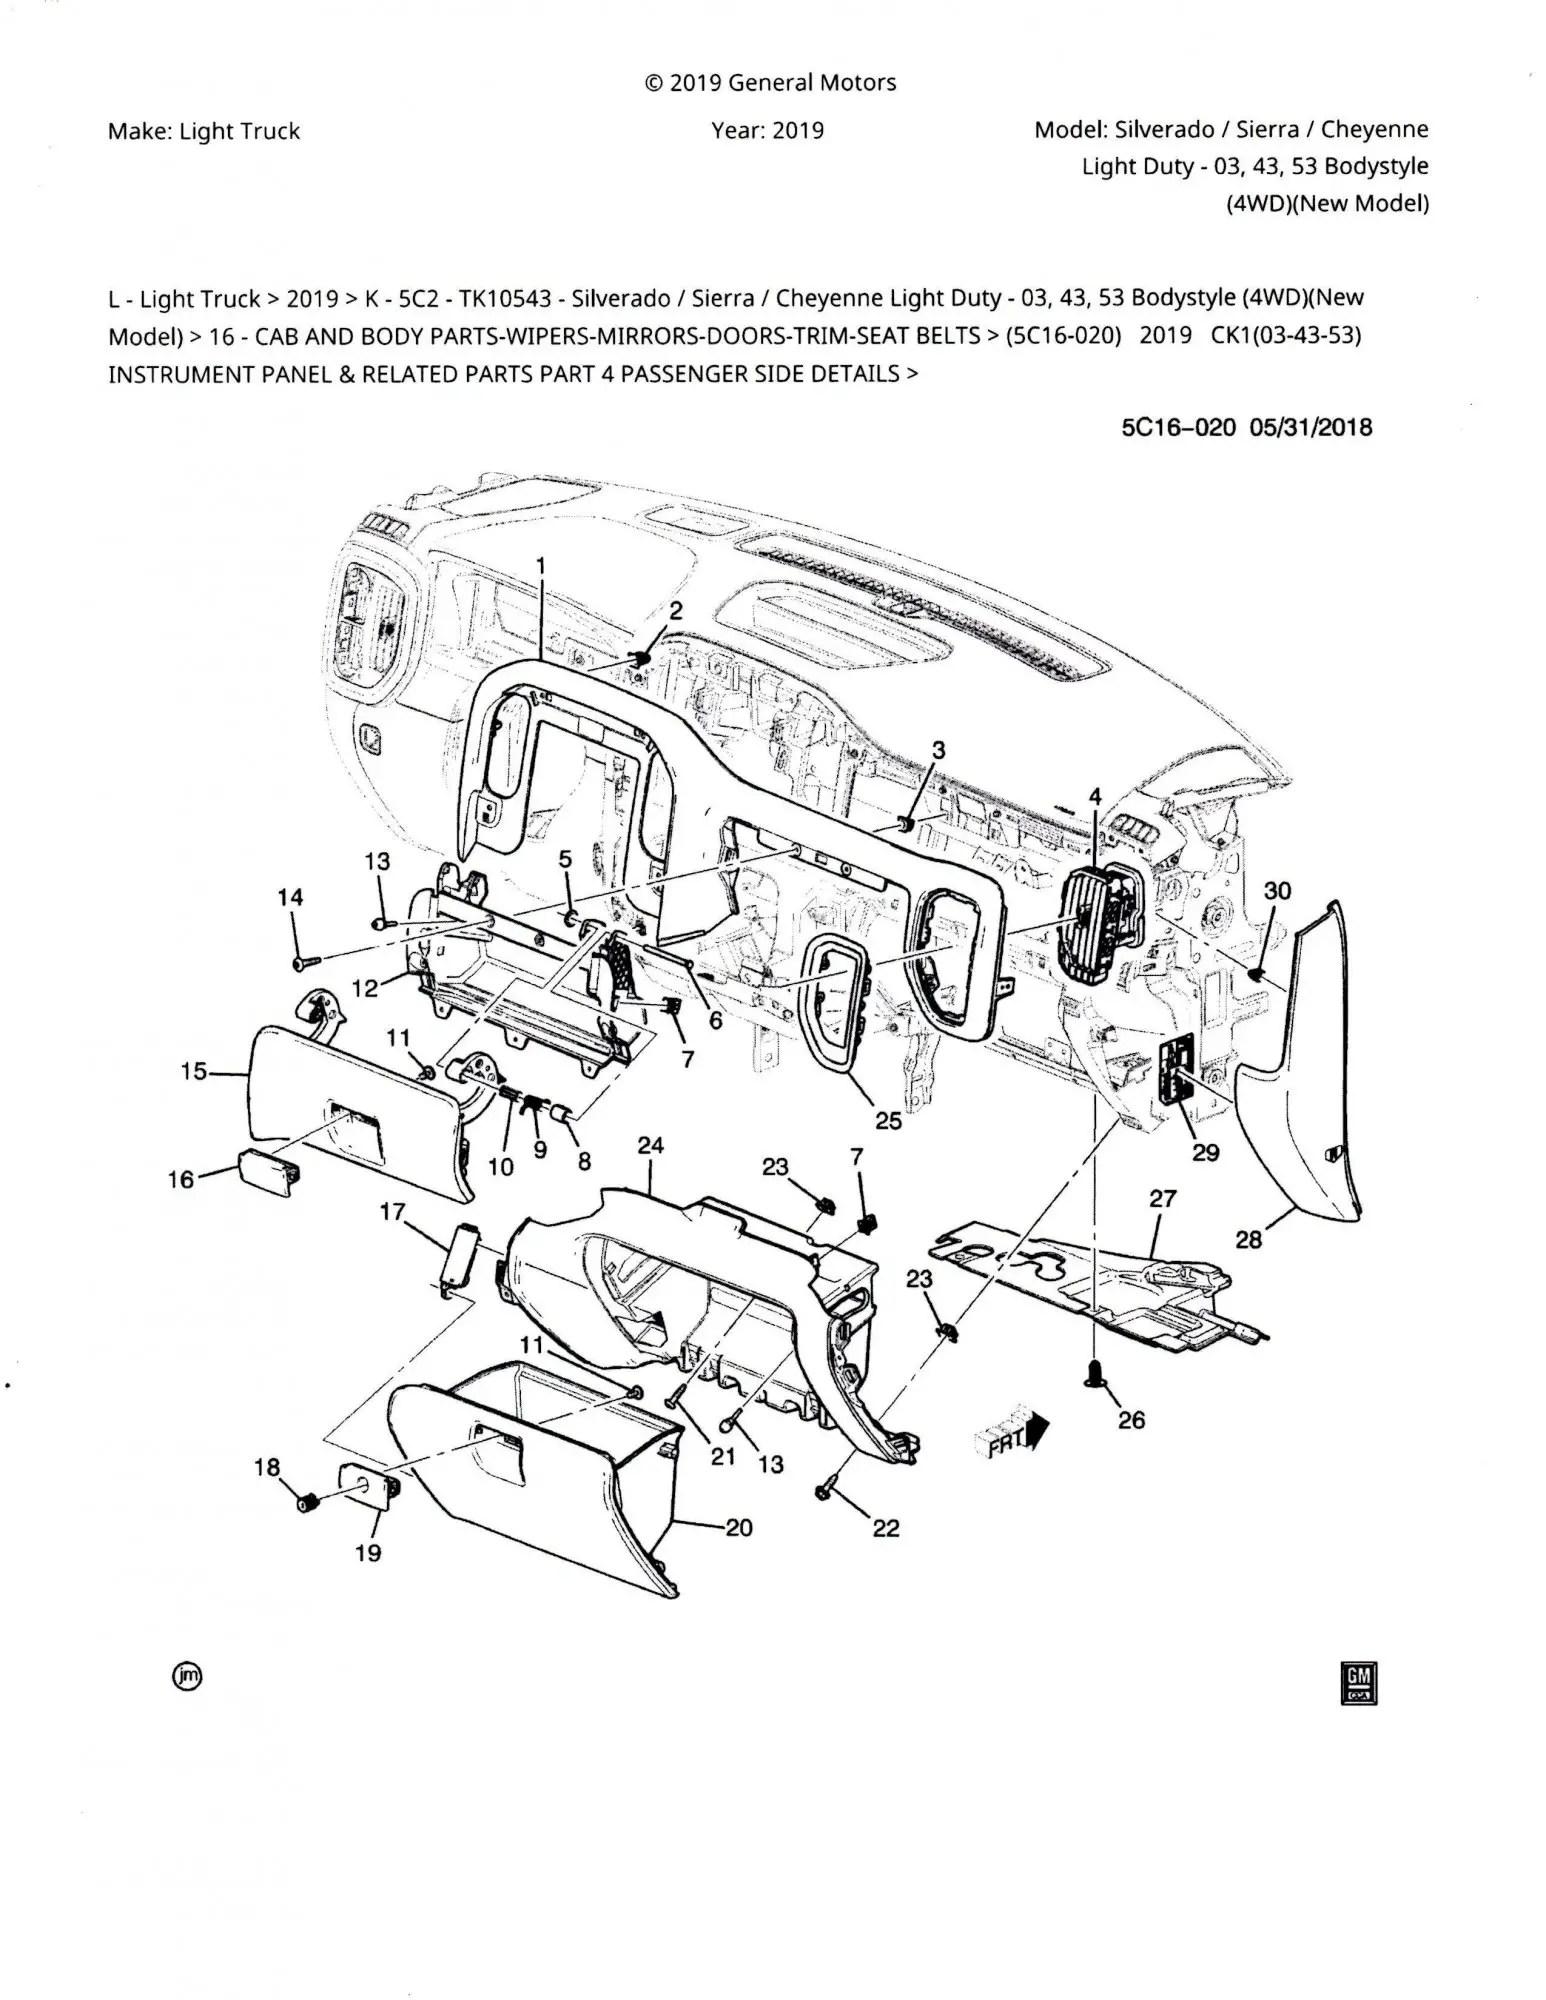 2019 Silverado Radio Wiring Diagram : silverado, radio, wiring, diagram, Anyone, Start, Tearing, Install, Sound, System?, 2019/2020, Silverado, Sierra, GM-Trucks.com